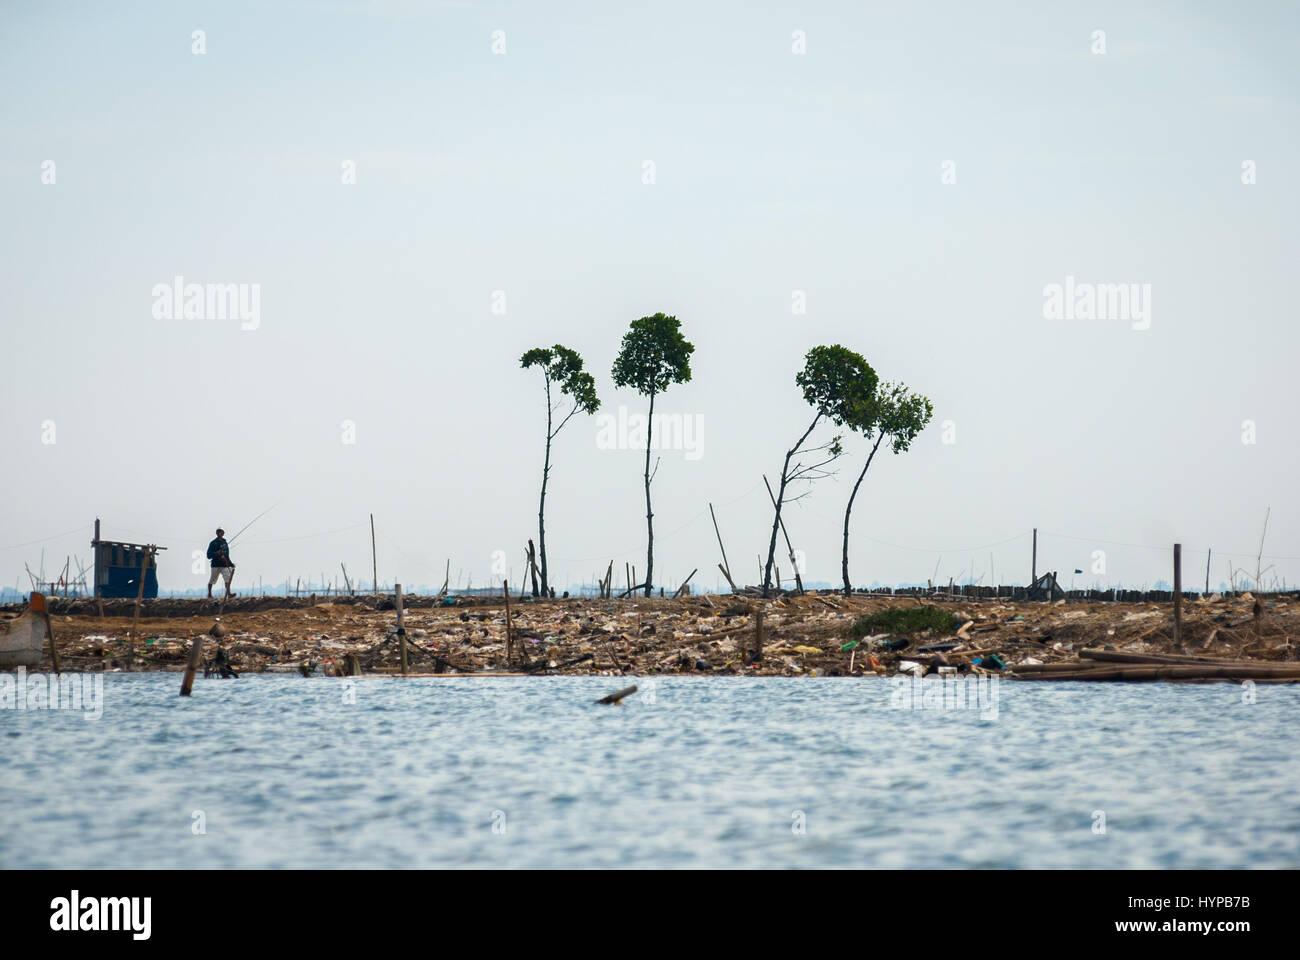 A man walking in the dry coastal land in North Jakarta, Jakarta, Indonesia. © Reynold Sumayku - Stock Image